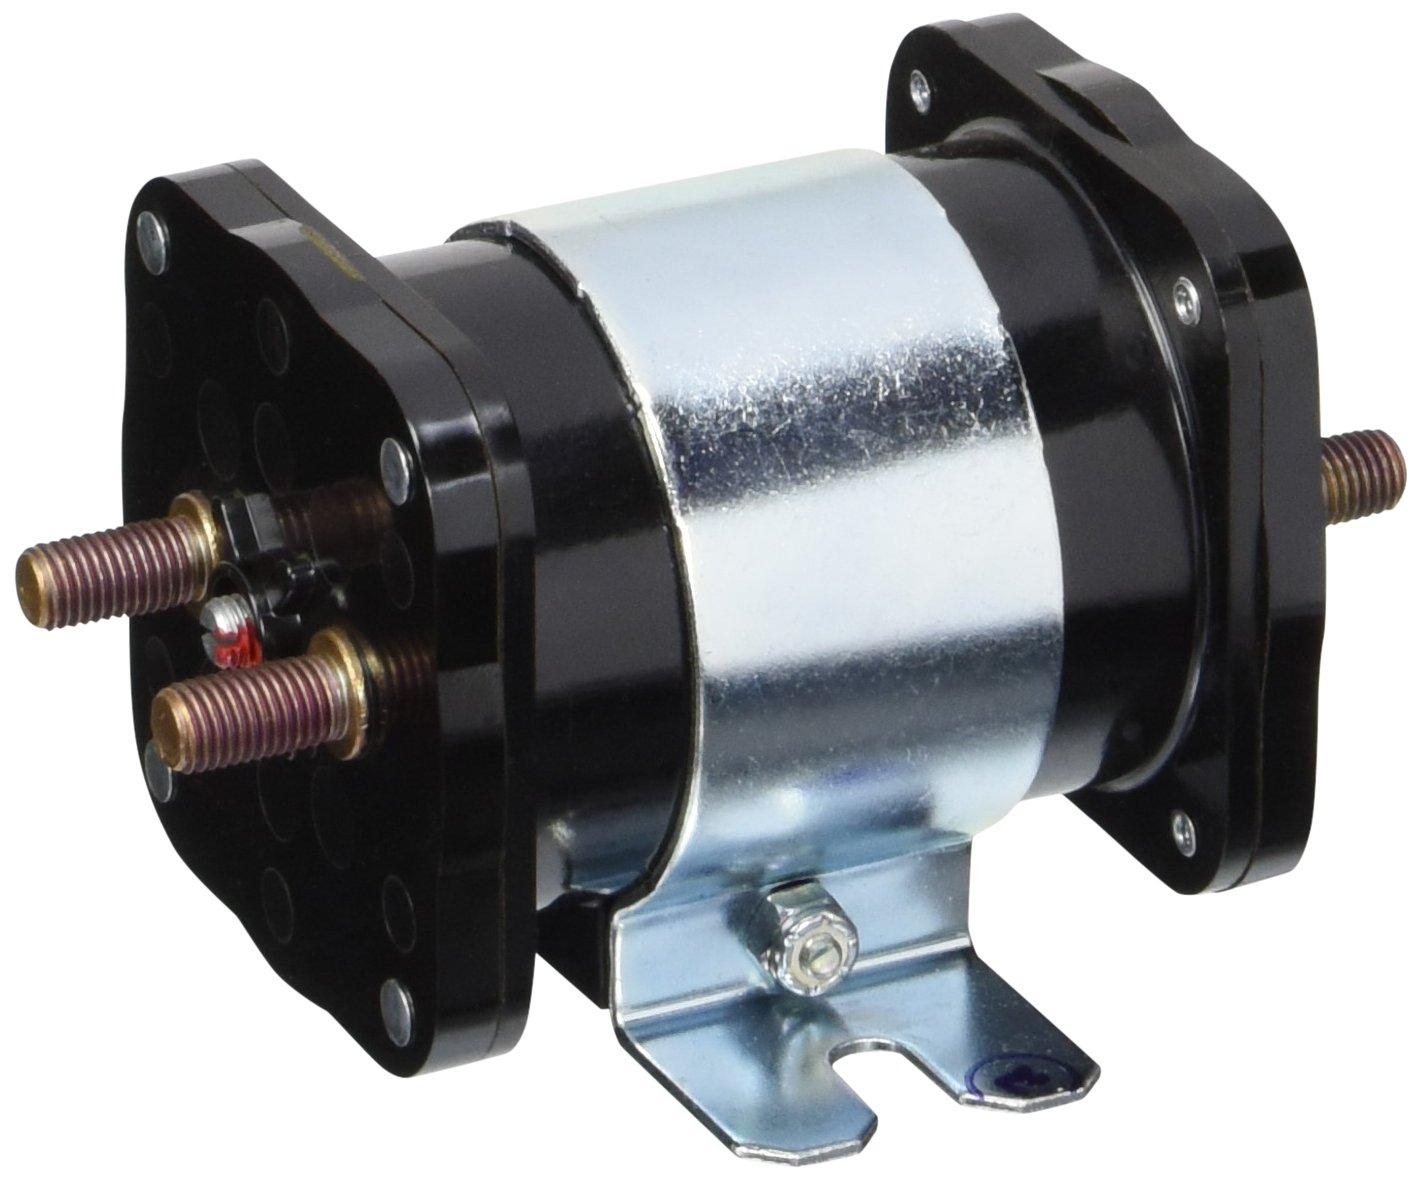 Emerson 586-317111 DC Power Solenoid, 36V, 200 Amp